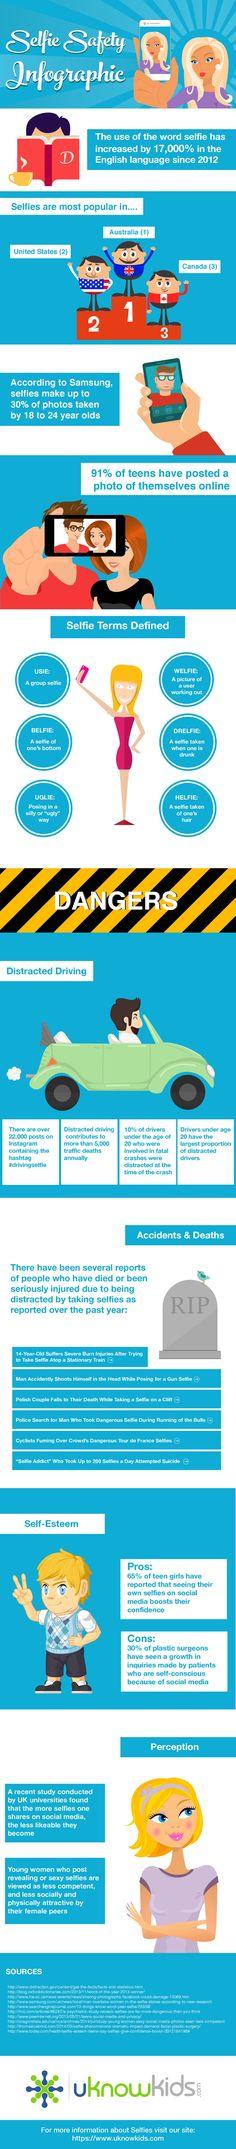 Selfie Safety #infographic #SocialMedia #Selfie